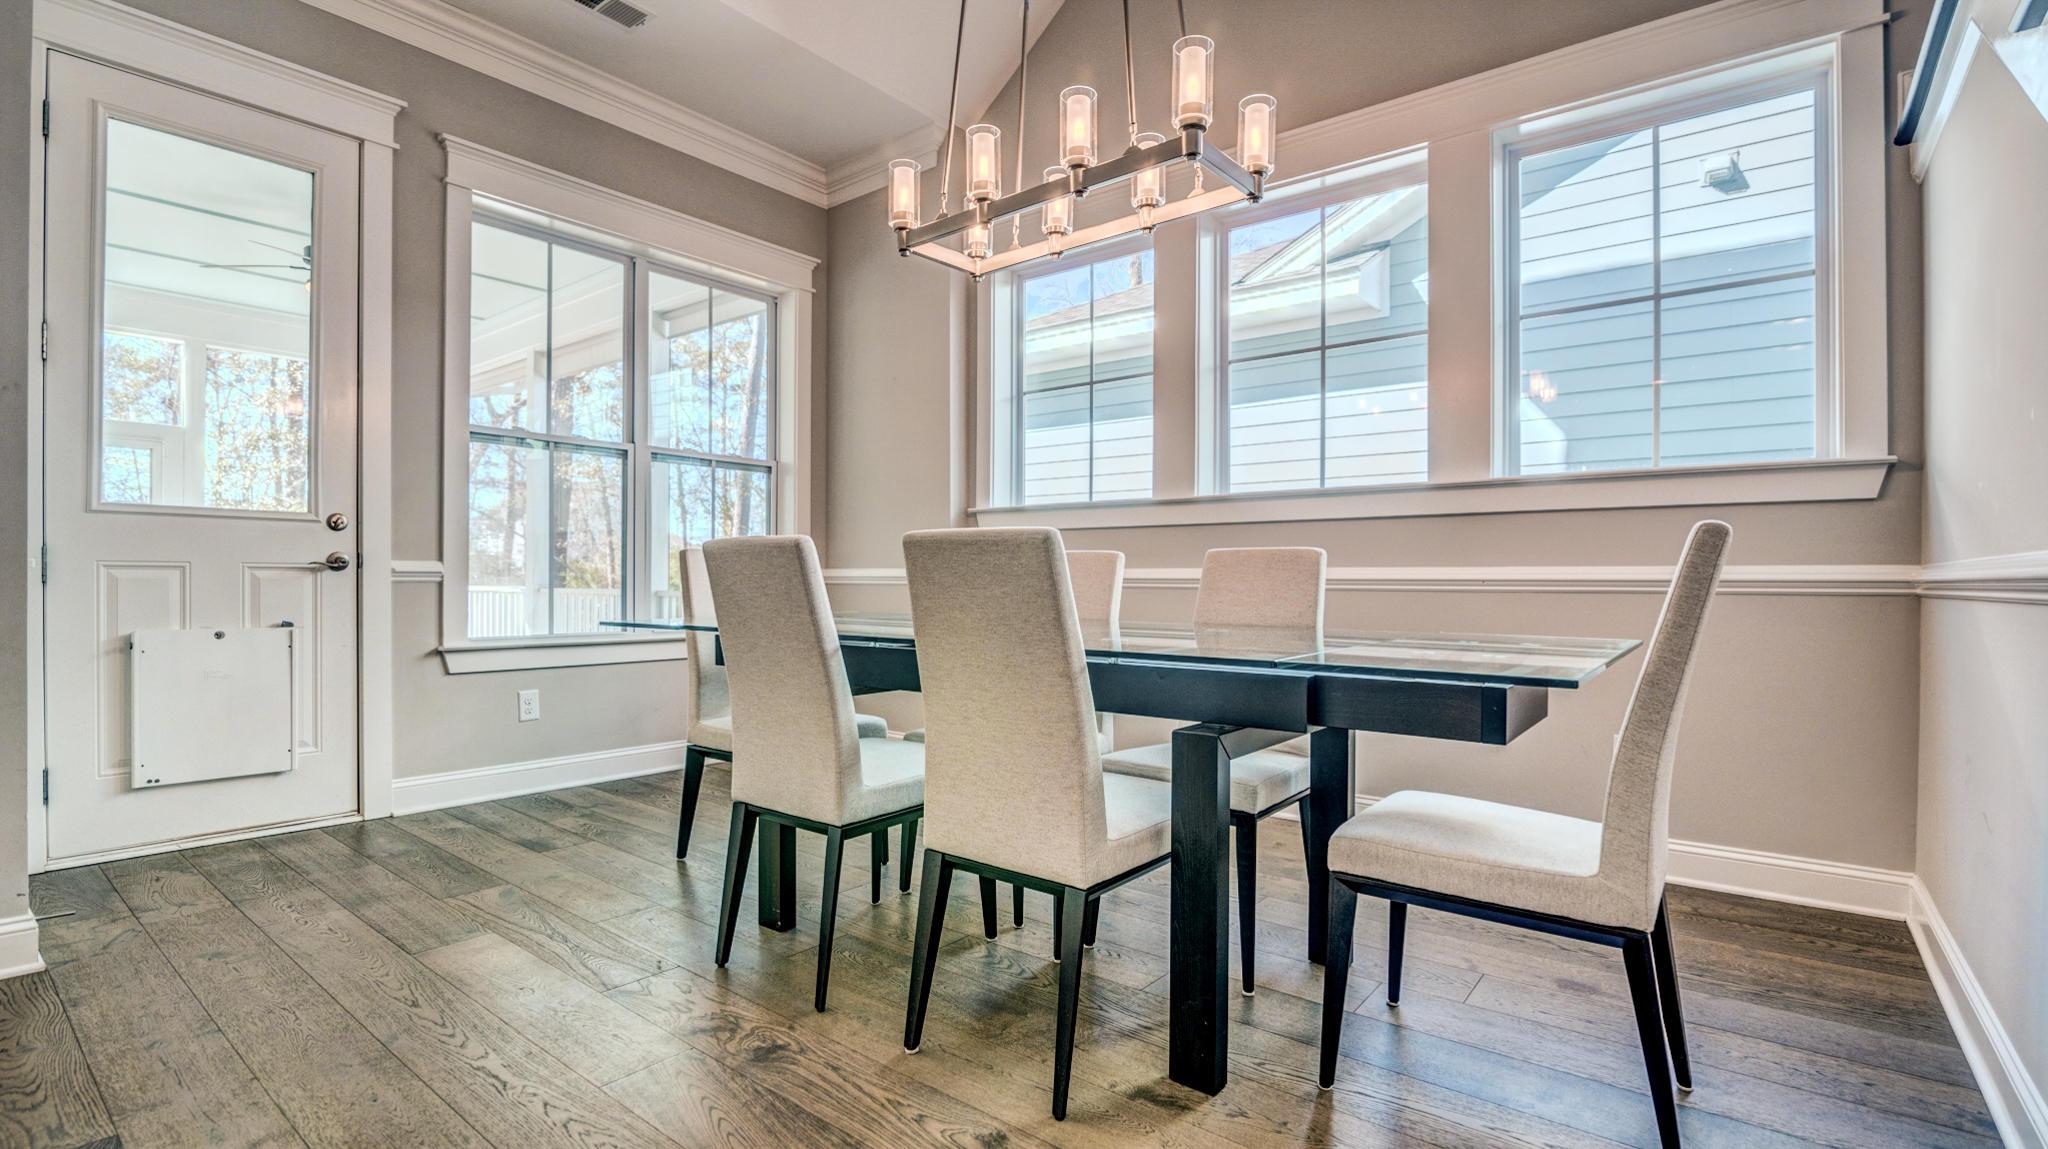 Carolina Park Homes For Sale - 3687 Spindrift, Mount Pleasant, SC - 8